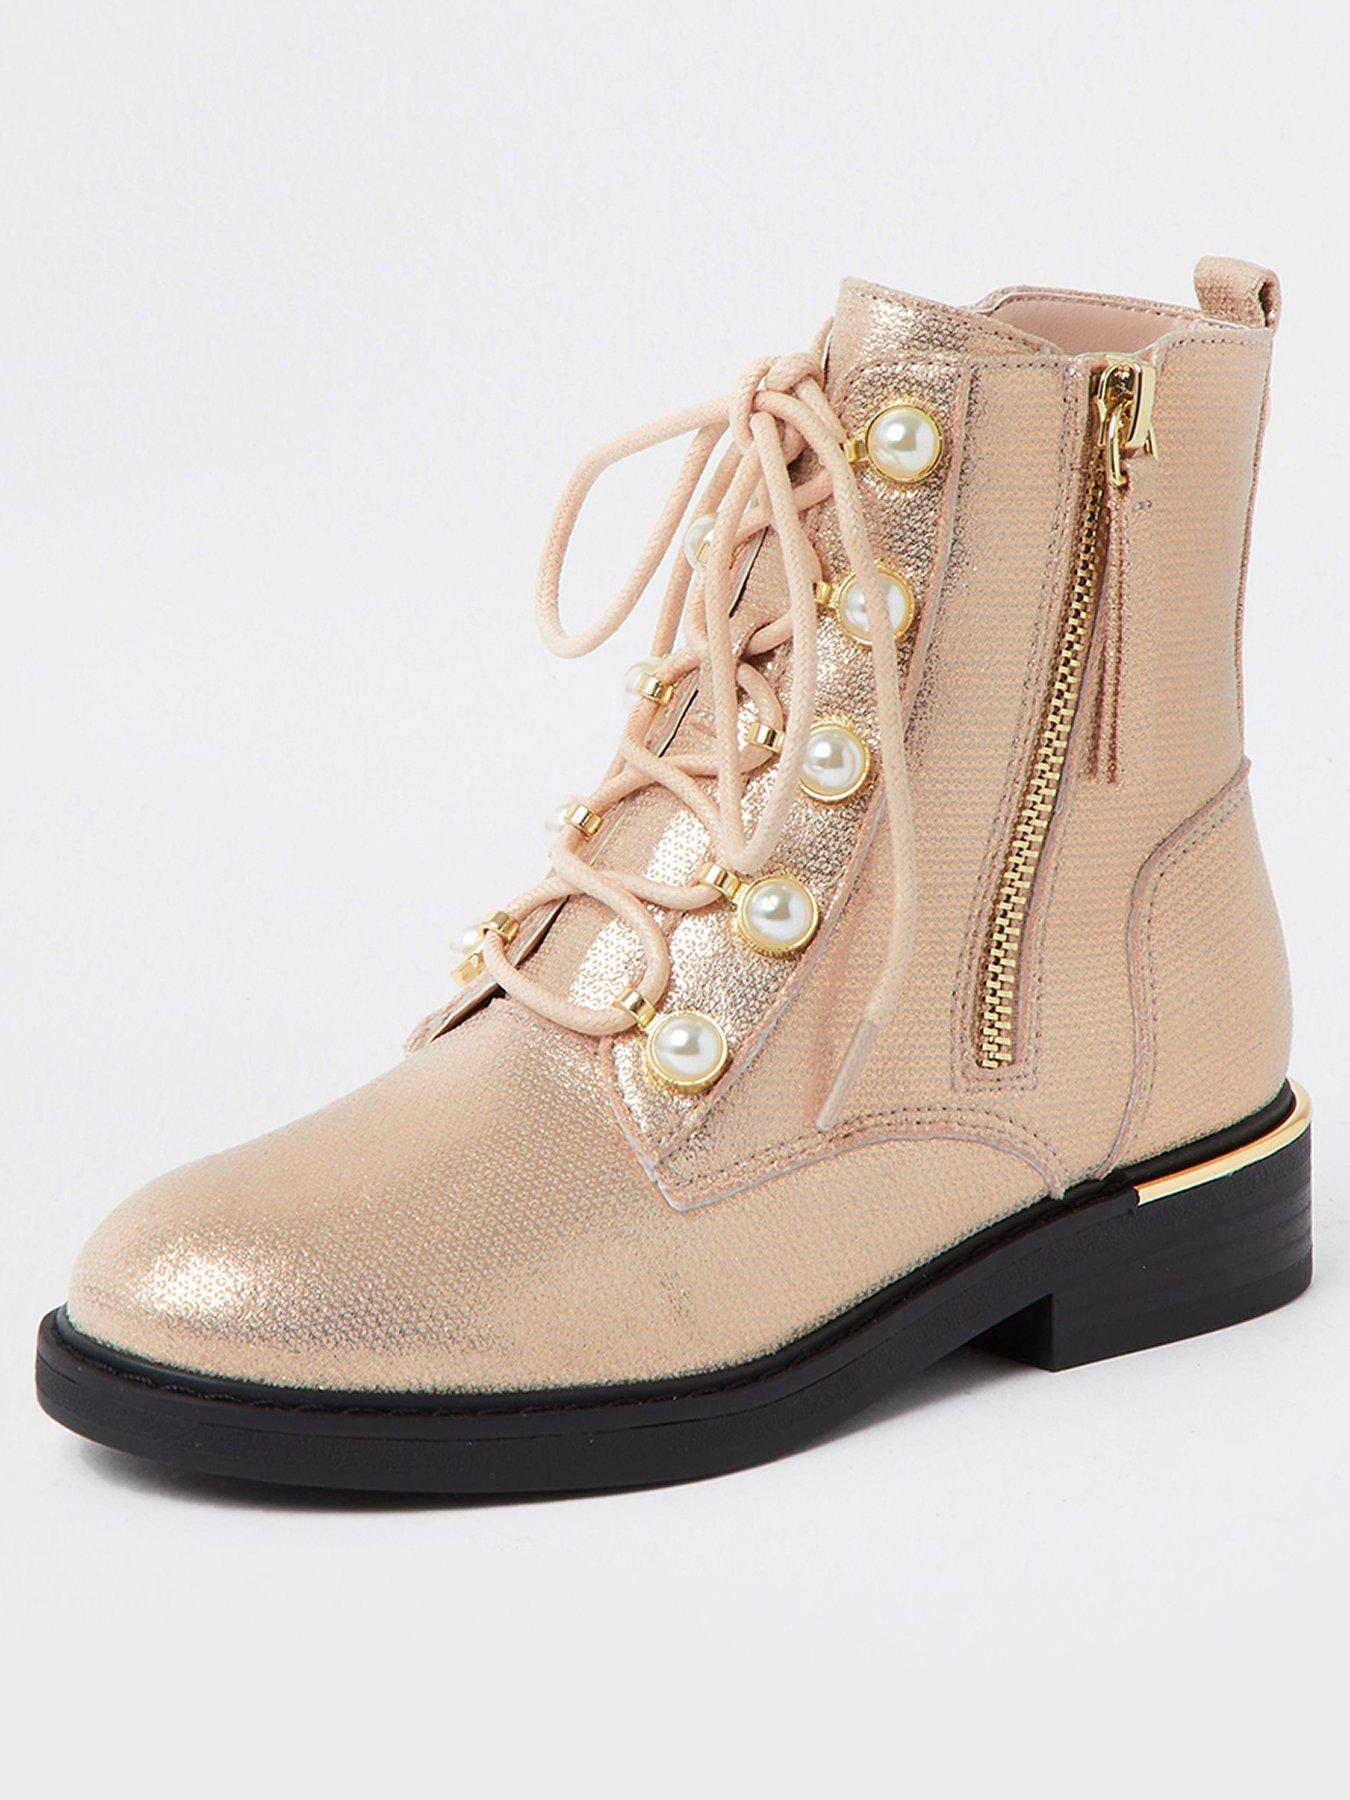 Boy | River island | Shoes \u0026 boots